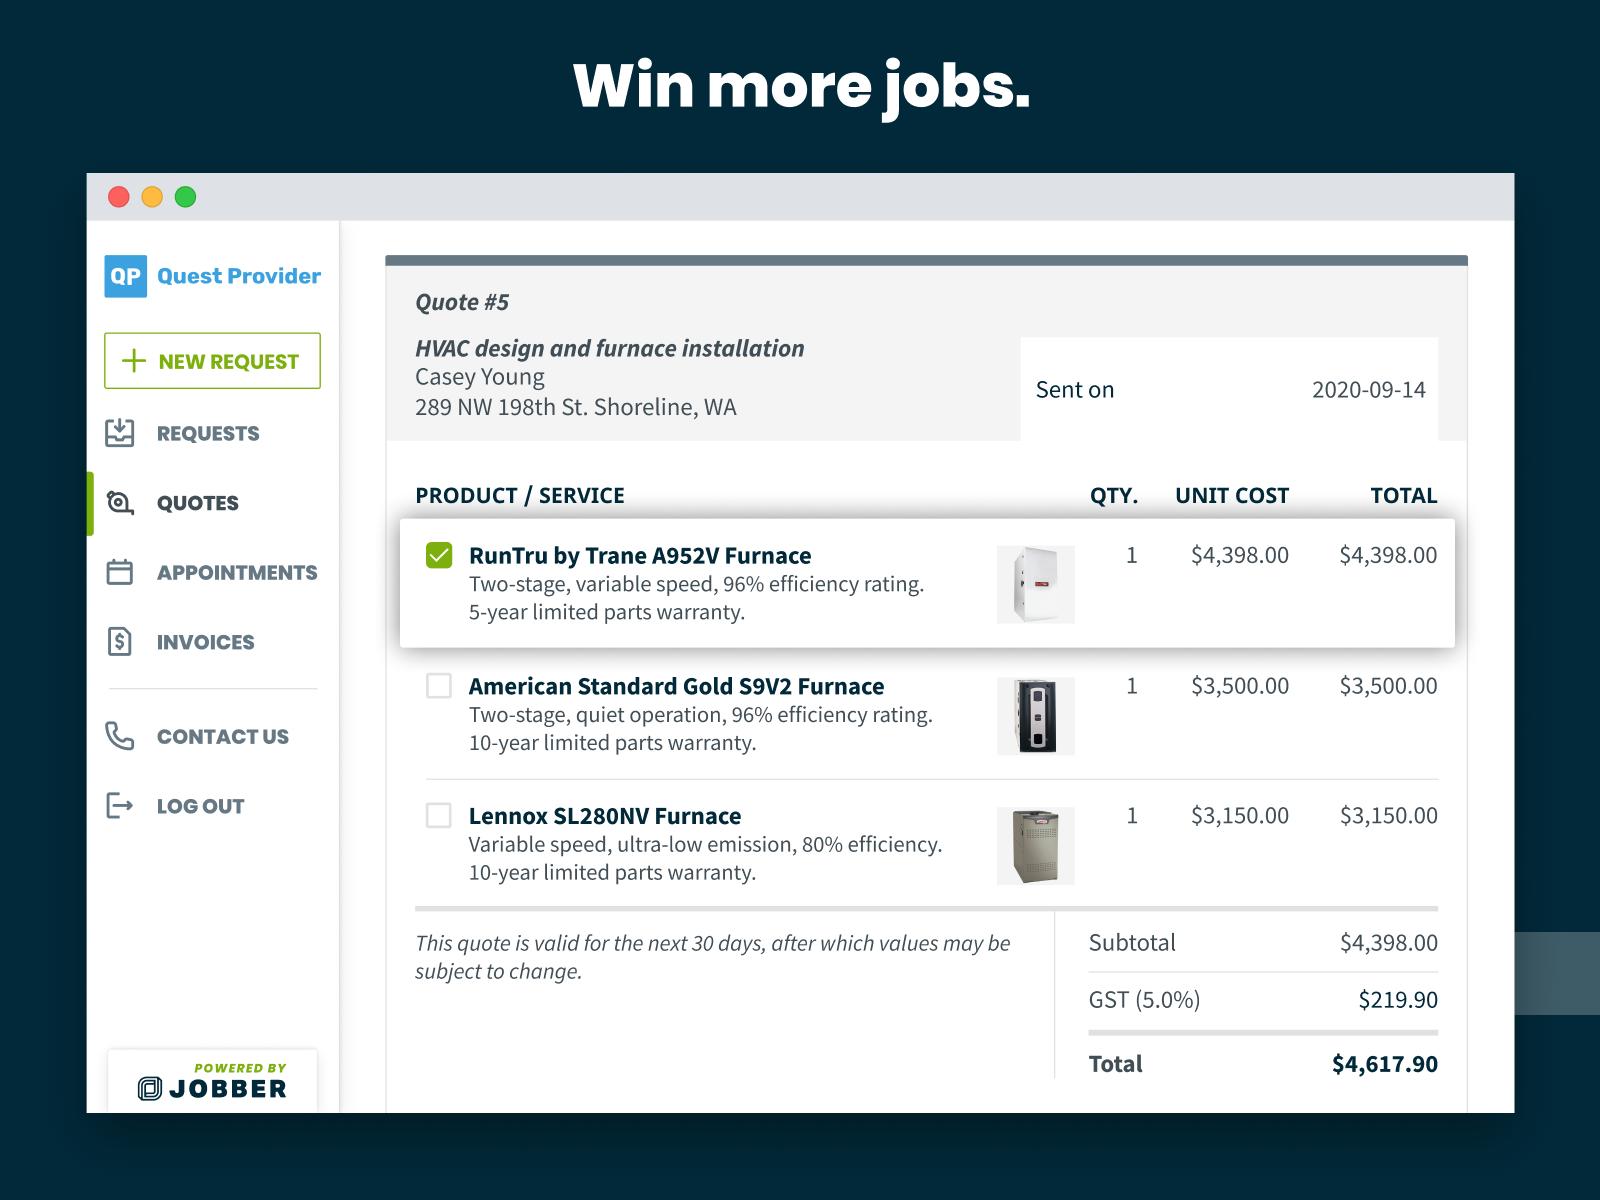 Jobber Software - Win more jobs.